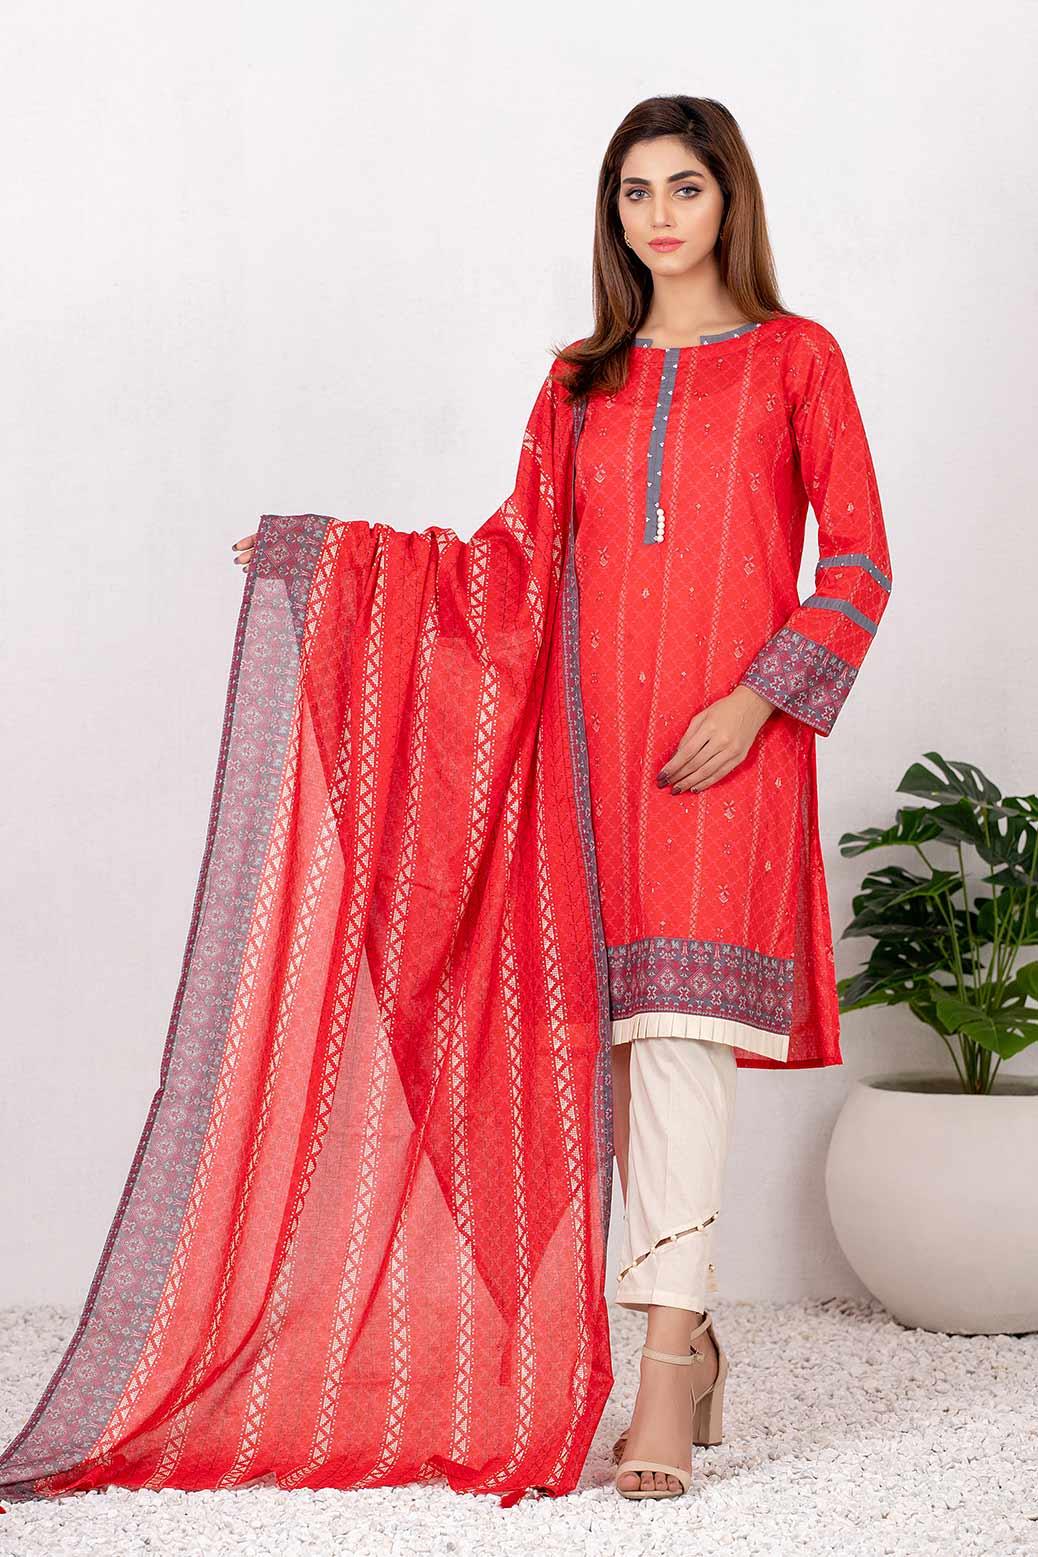 Bonanza Satrangi Red Lawn Summer Suit